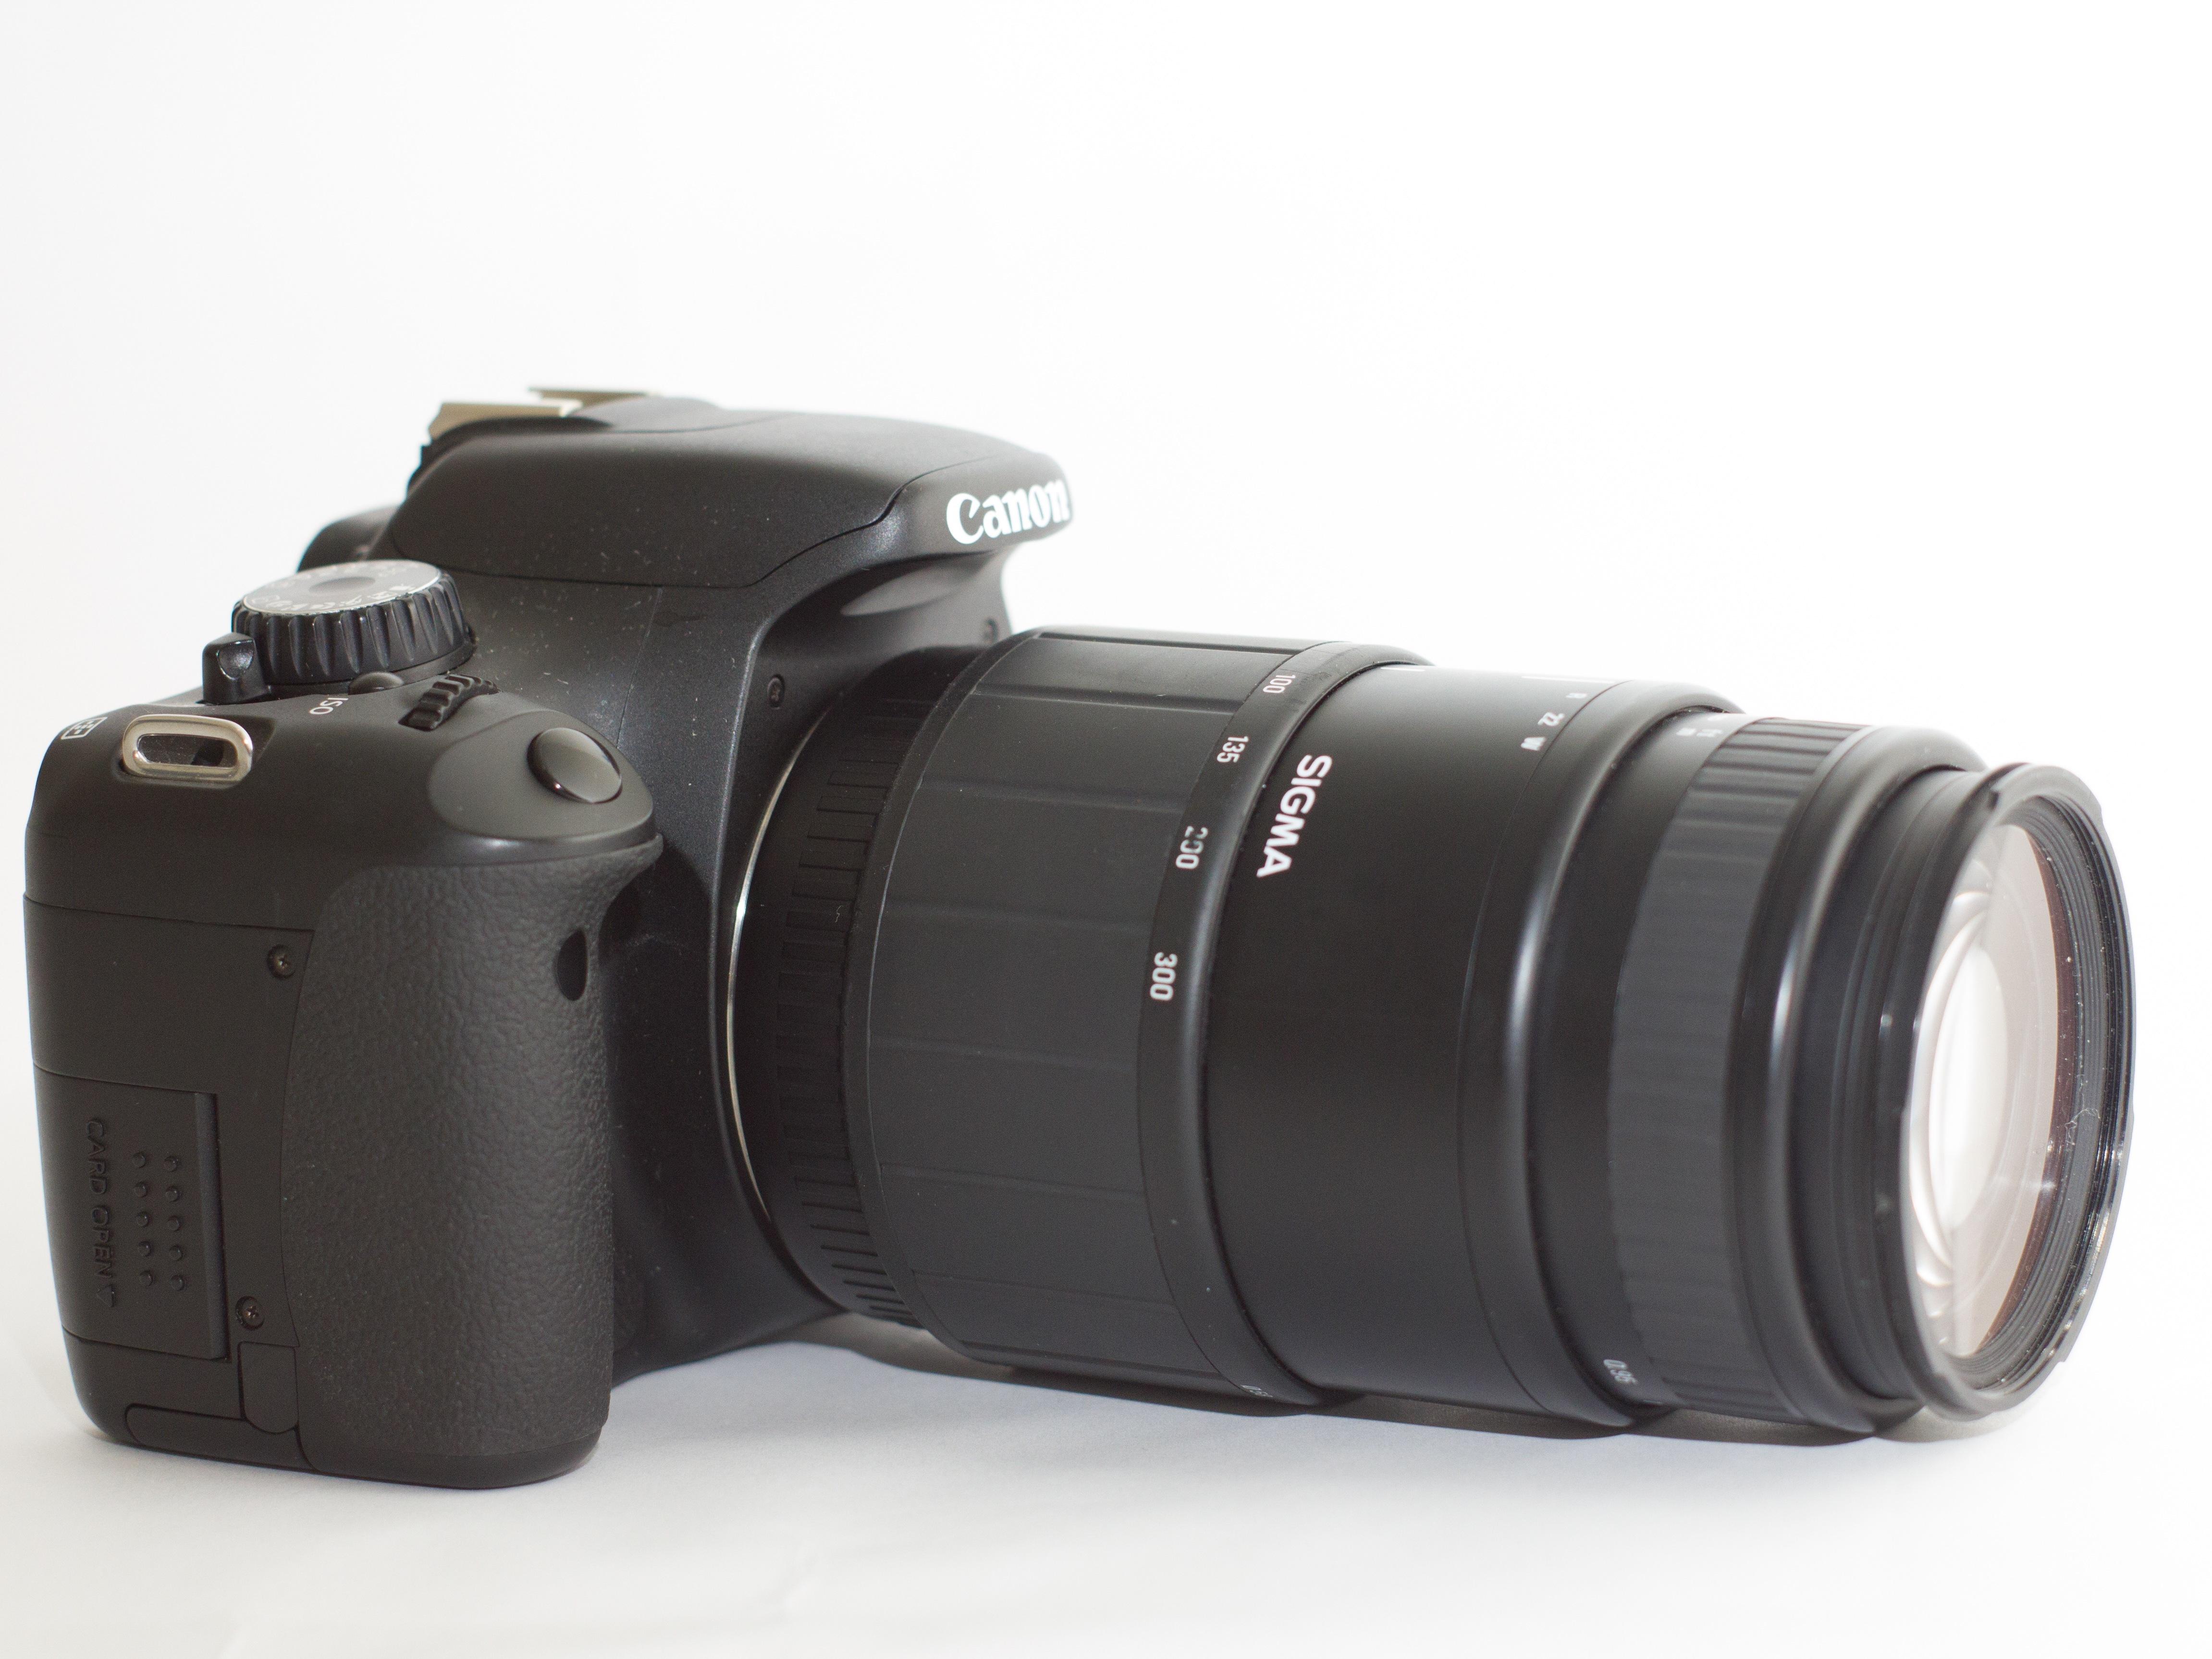 Canon Eos Rebel T2i Manual